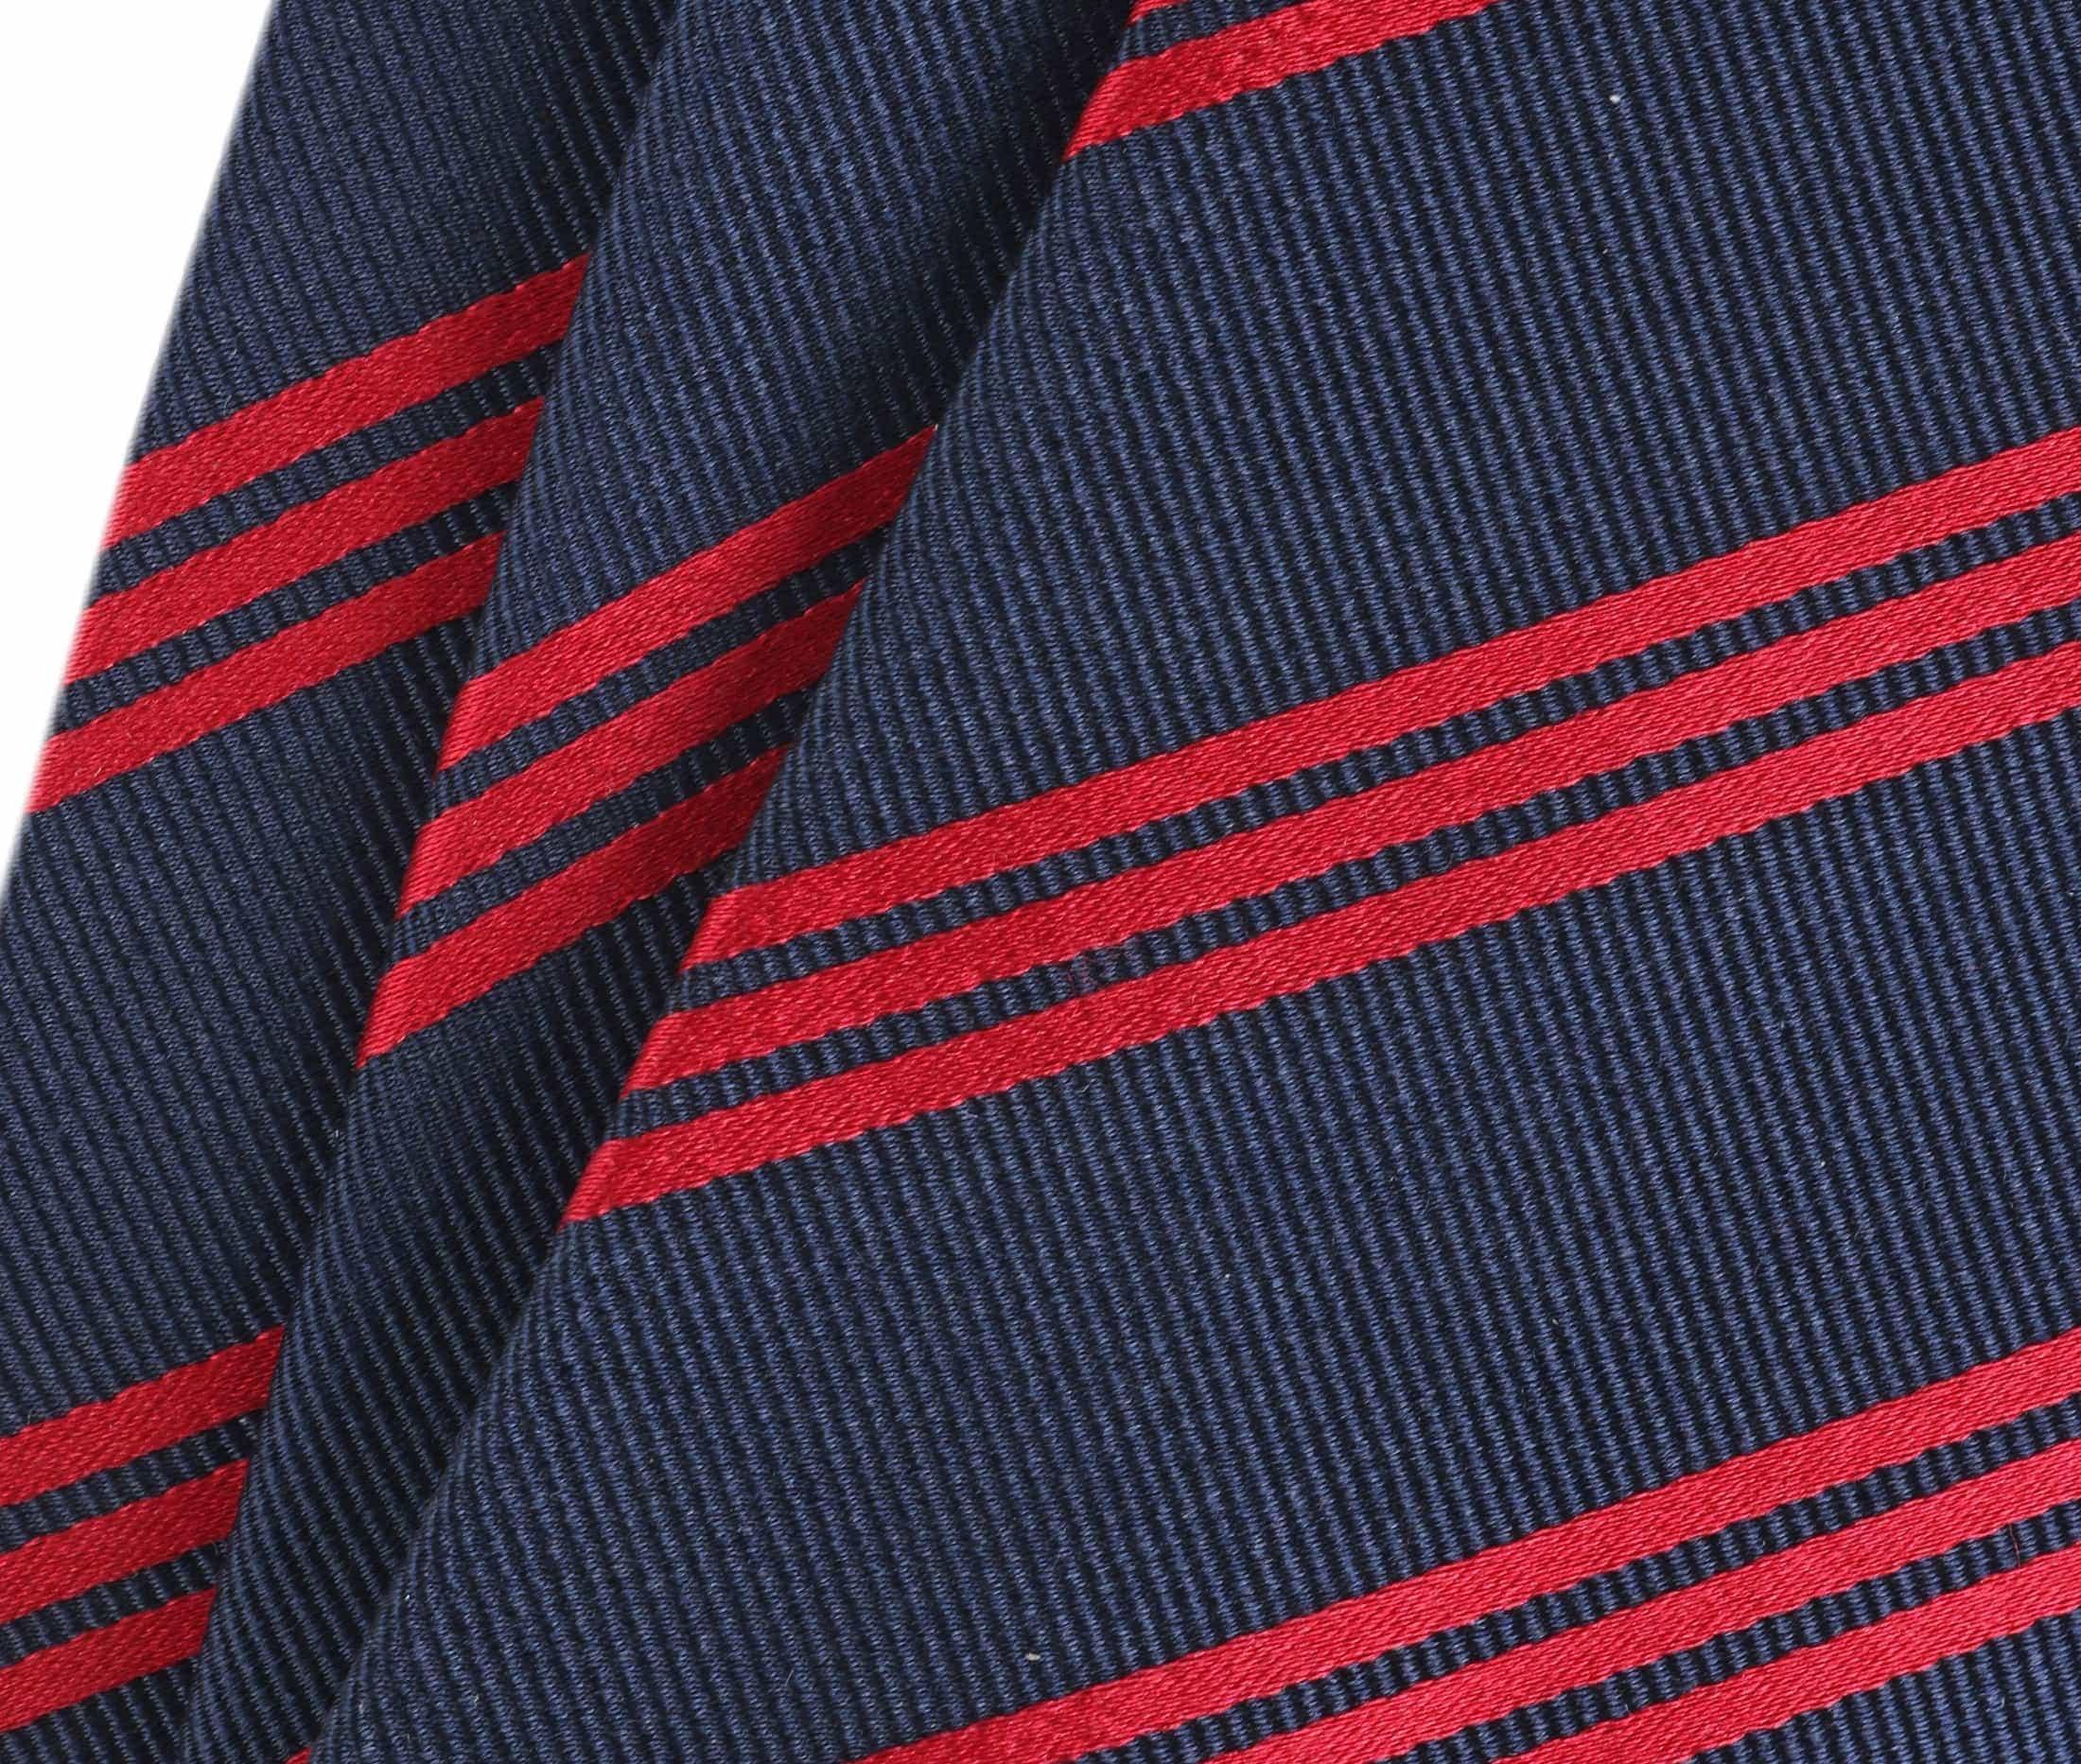 Krawatte Seide Streifen Navy Rot foto 1